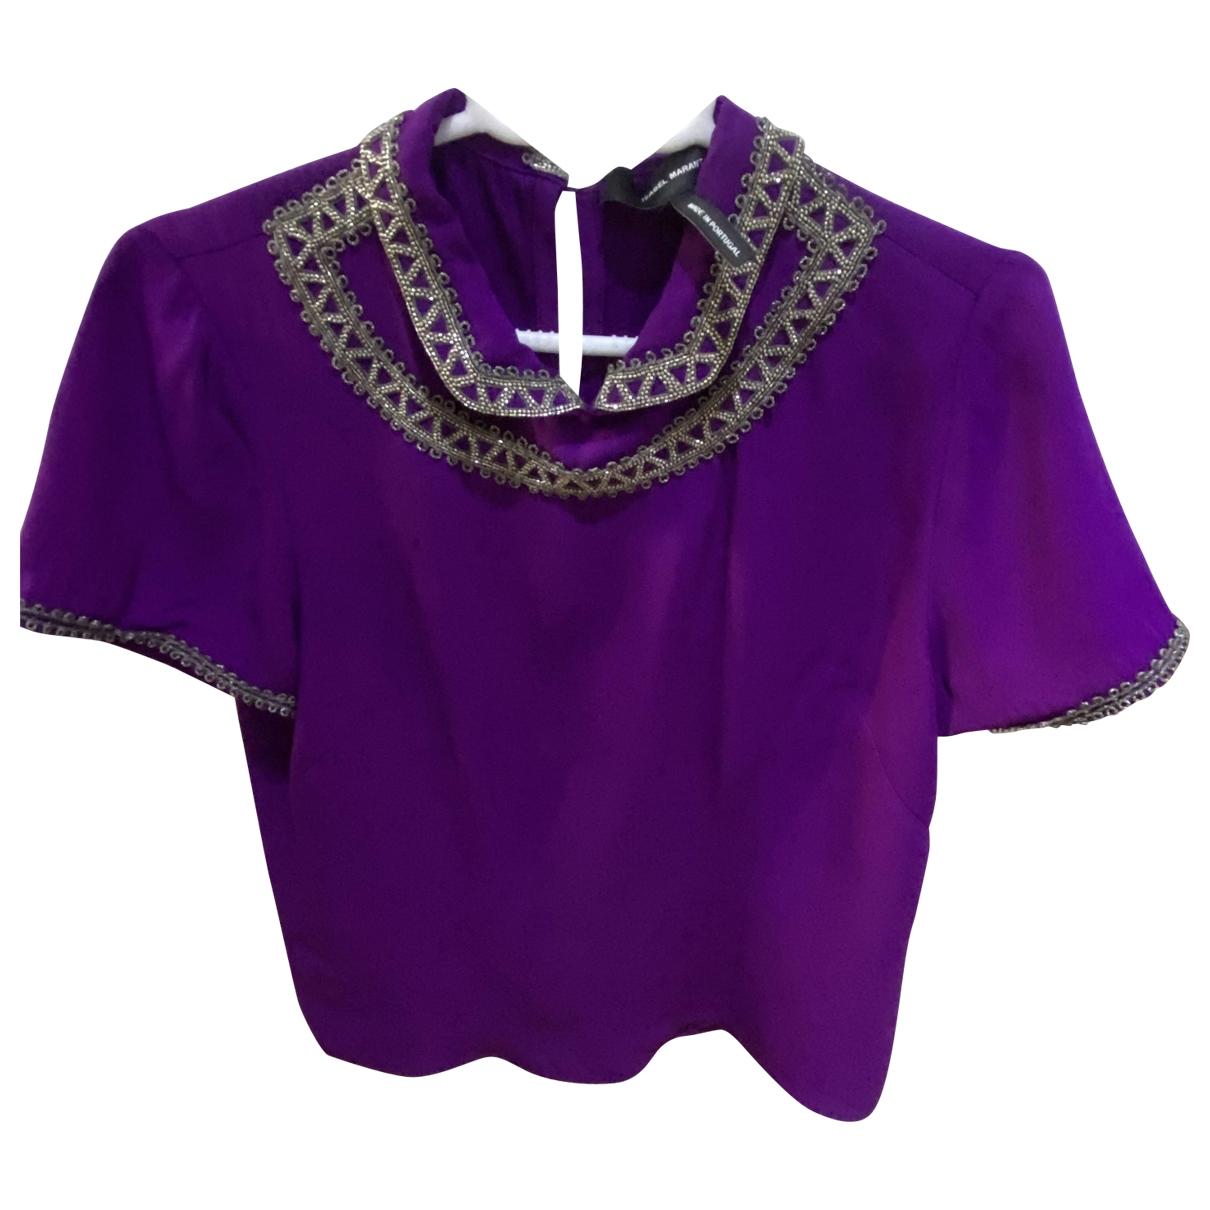 Isabel Marant - Top   pour femme - violet